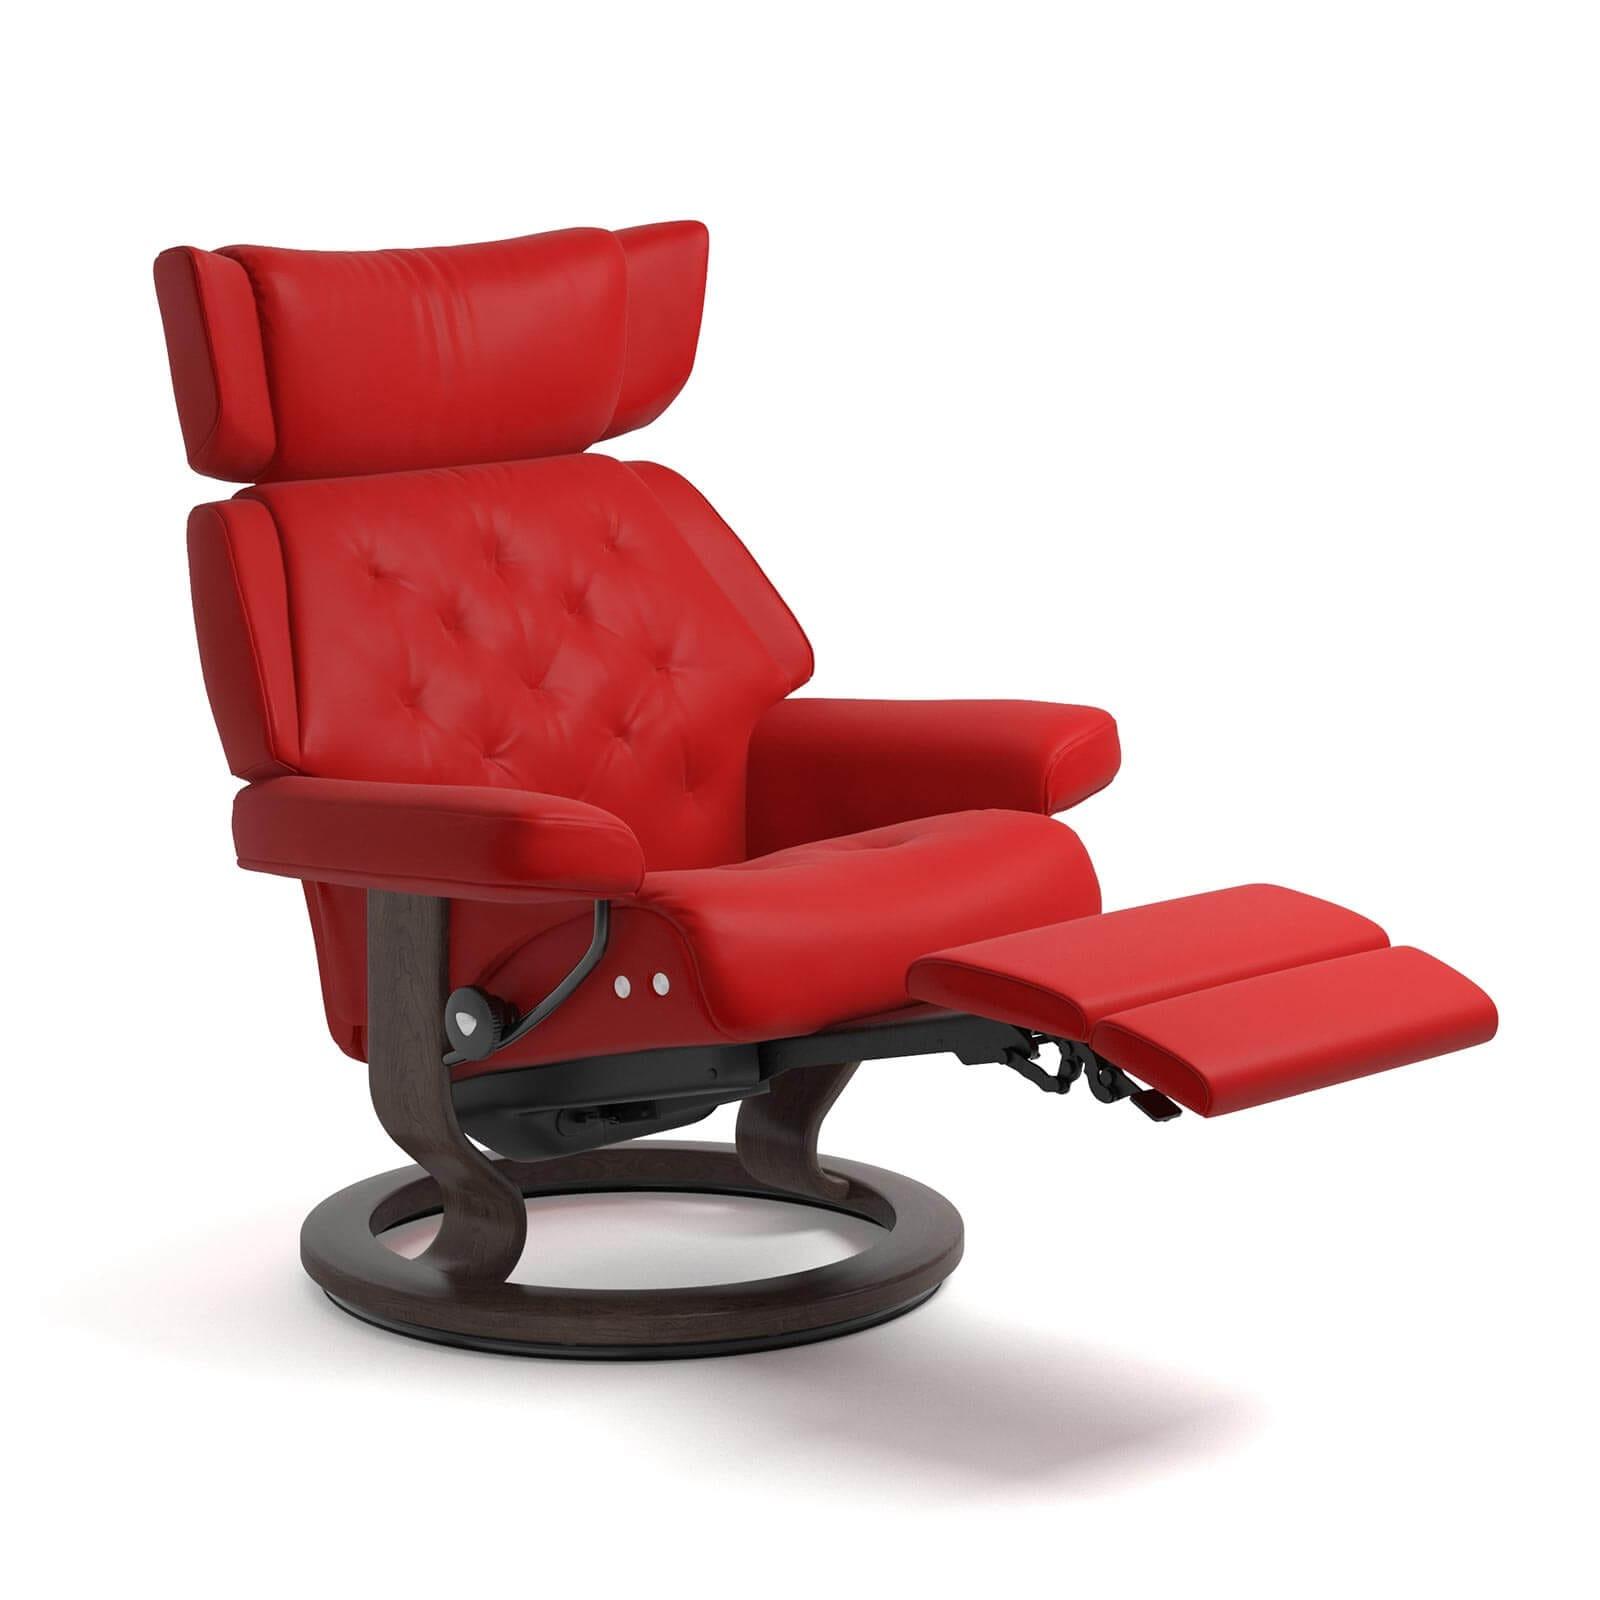 stressless sessel skyline legcomfort chilli red stressless. Black Bedroom Furniture Sets. Home Design Ideas